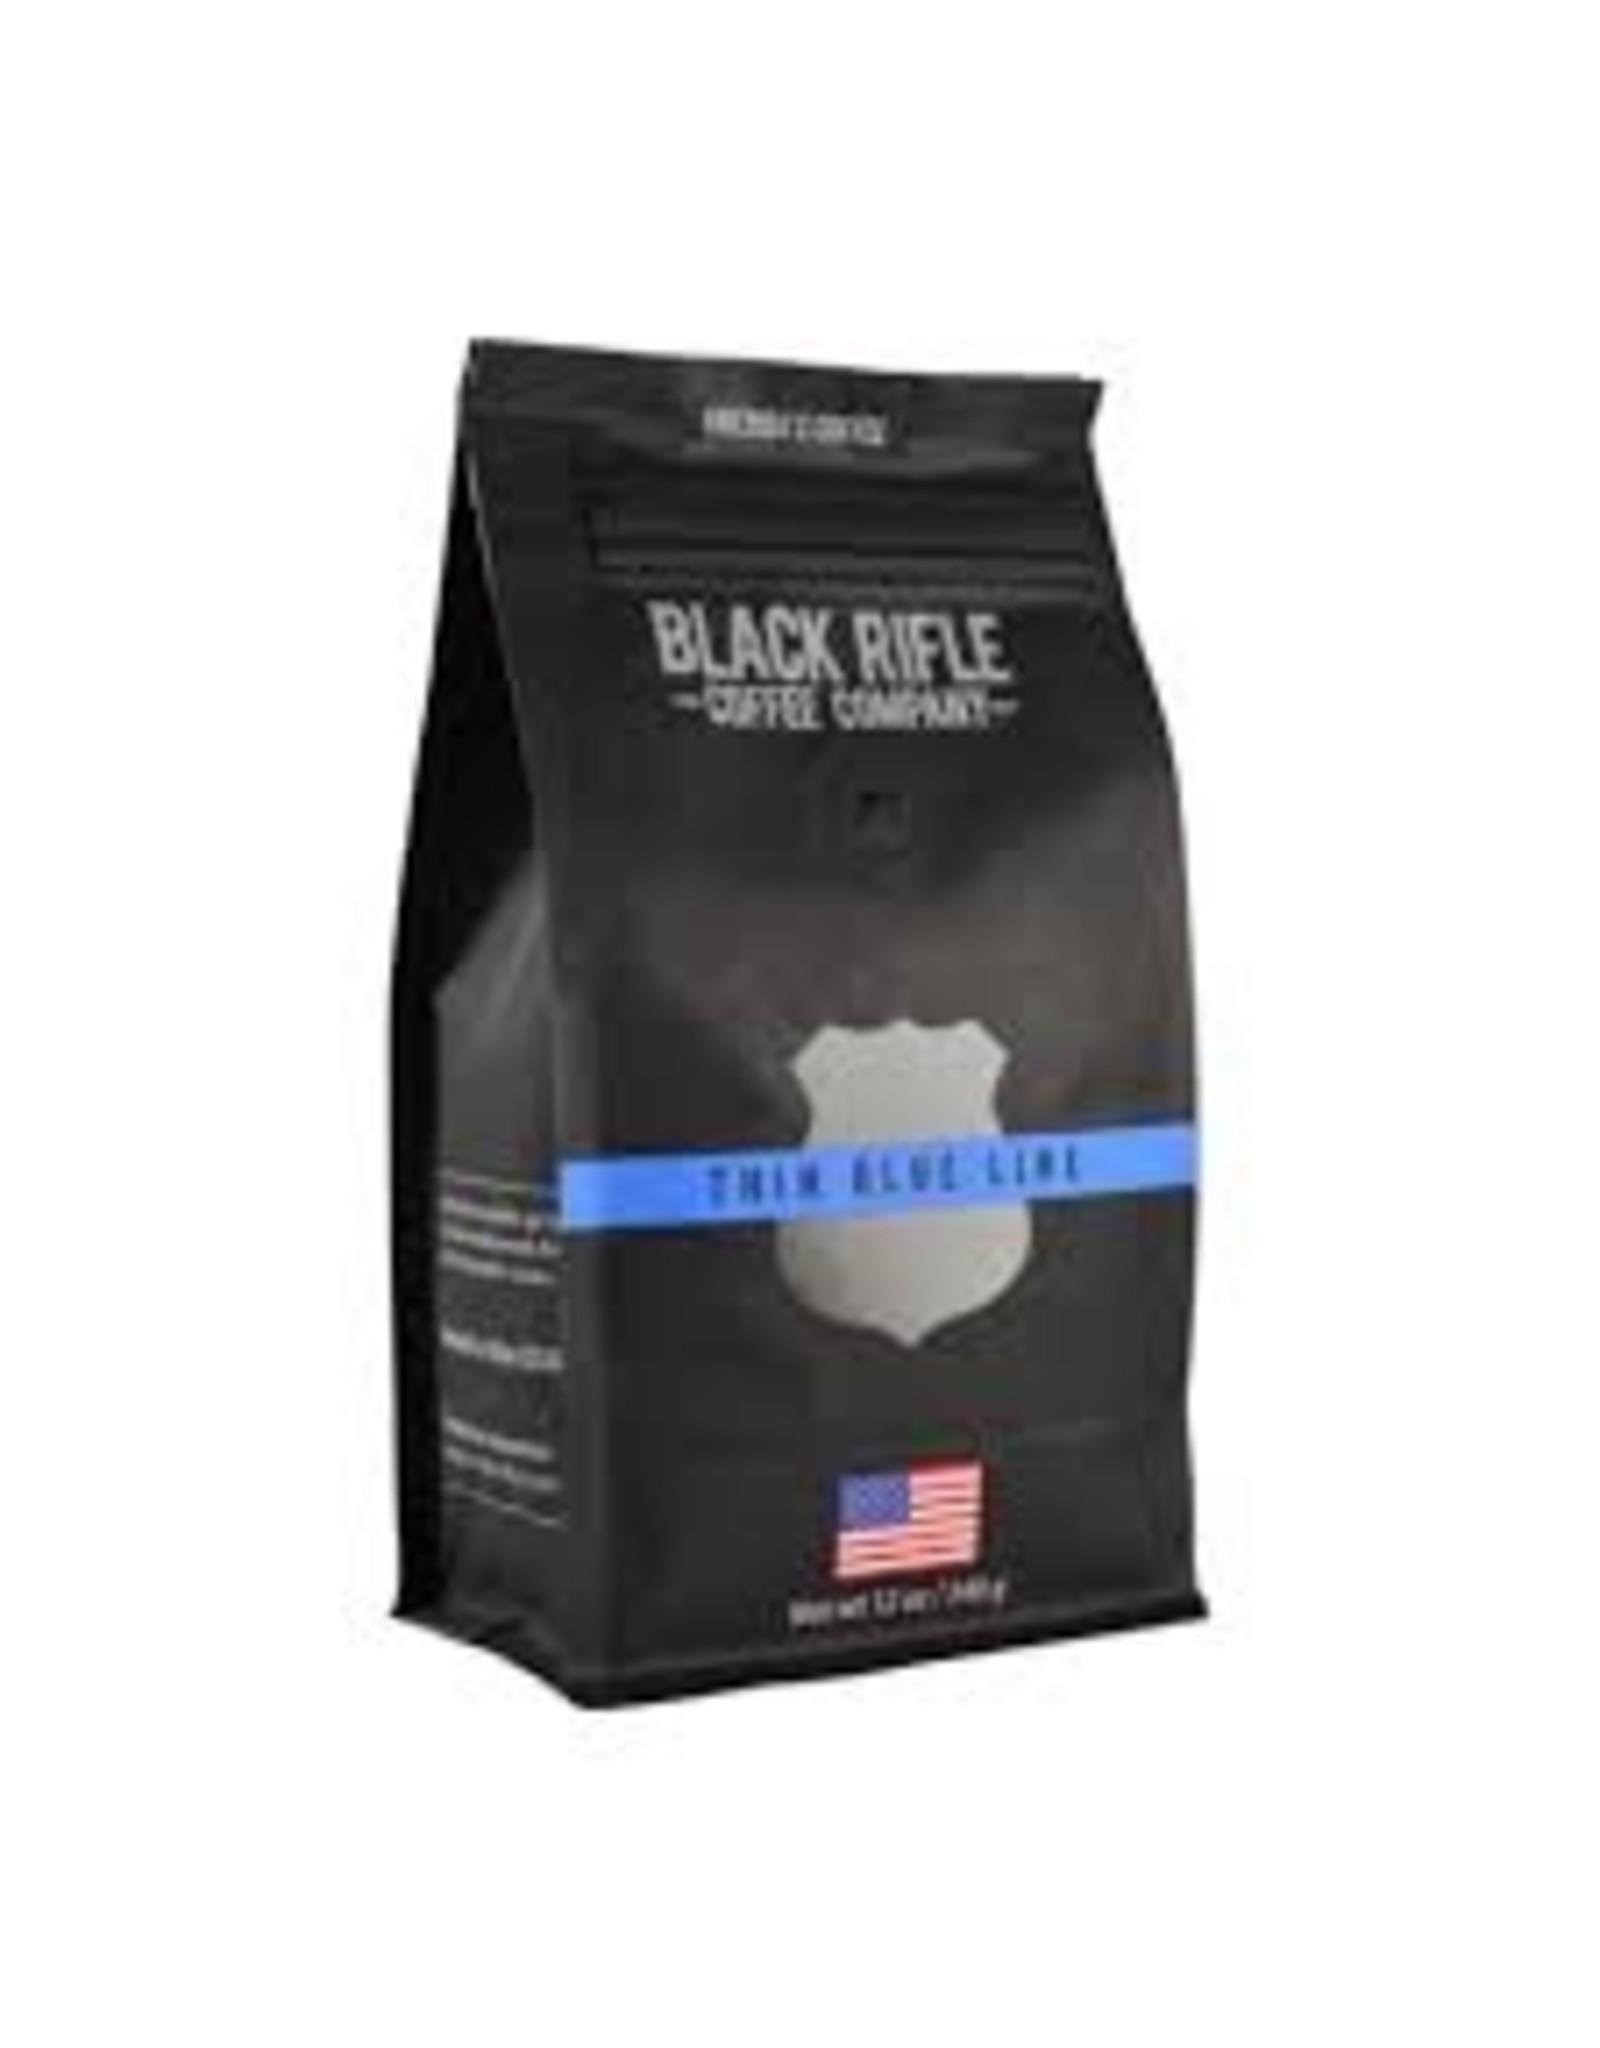 BRCC - Thin Blue Line - Grounds 12oz